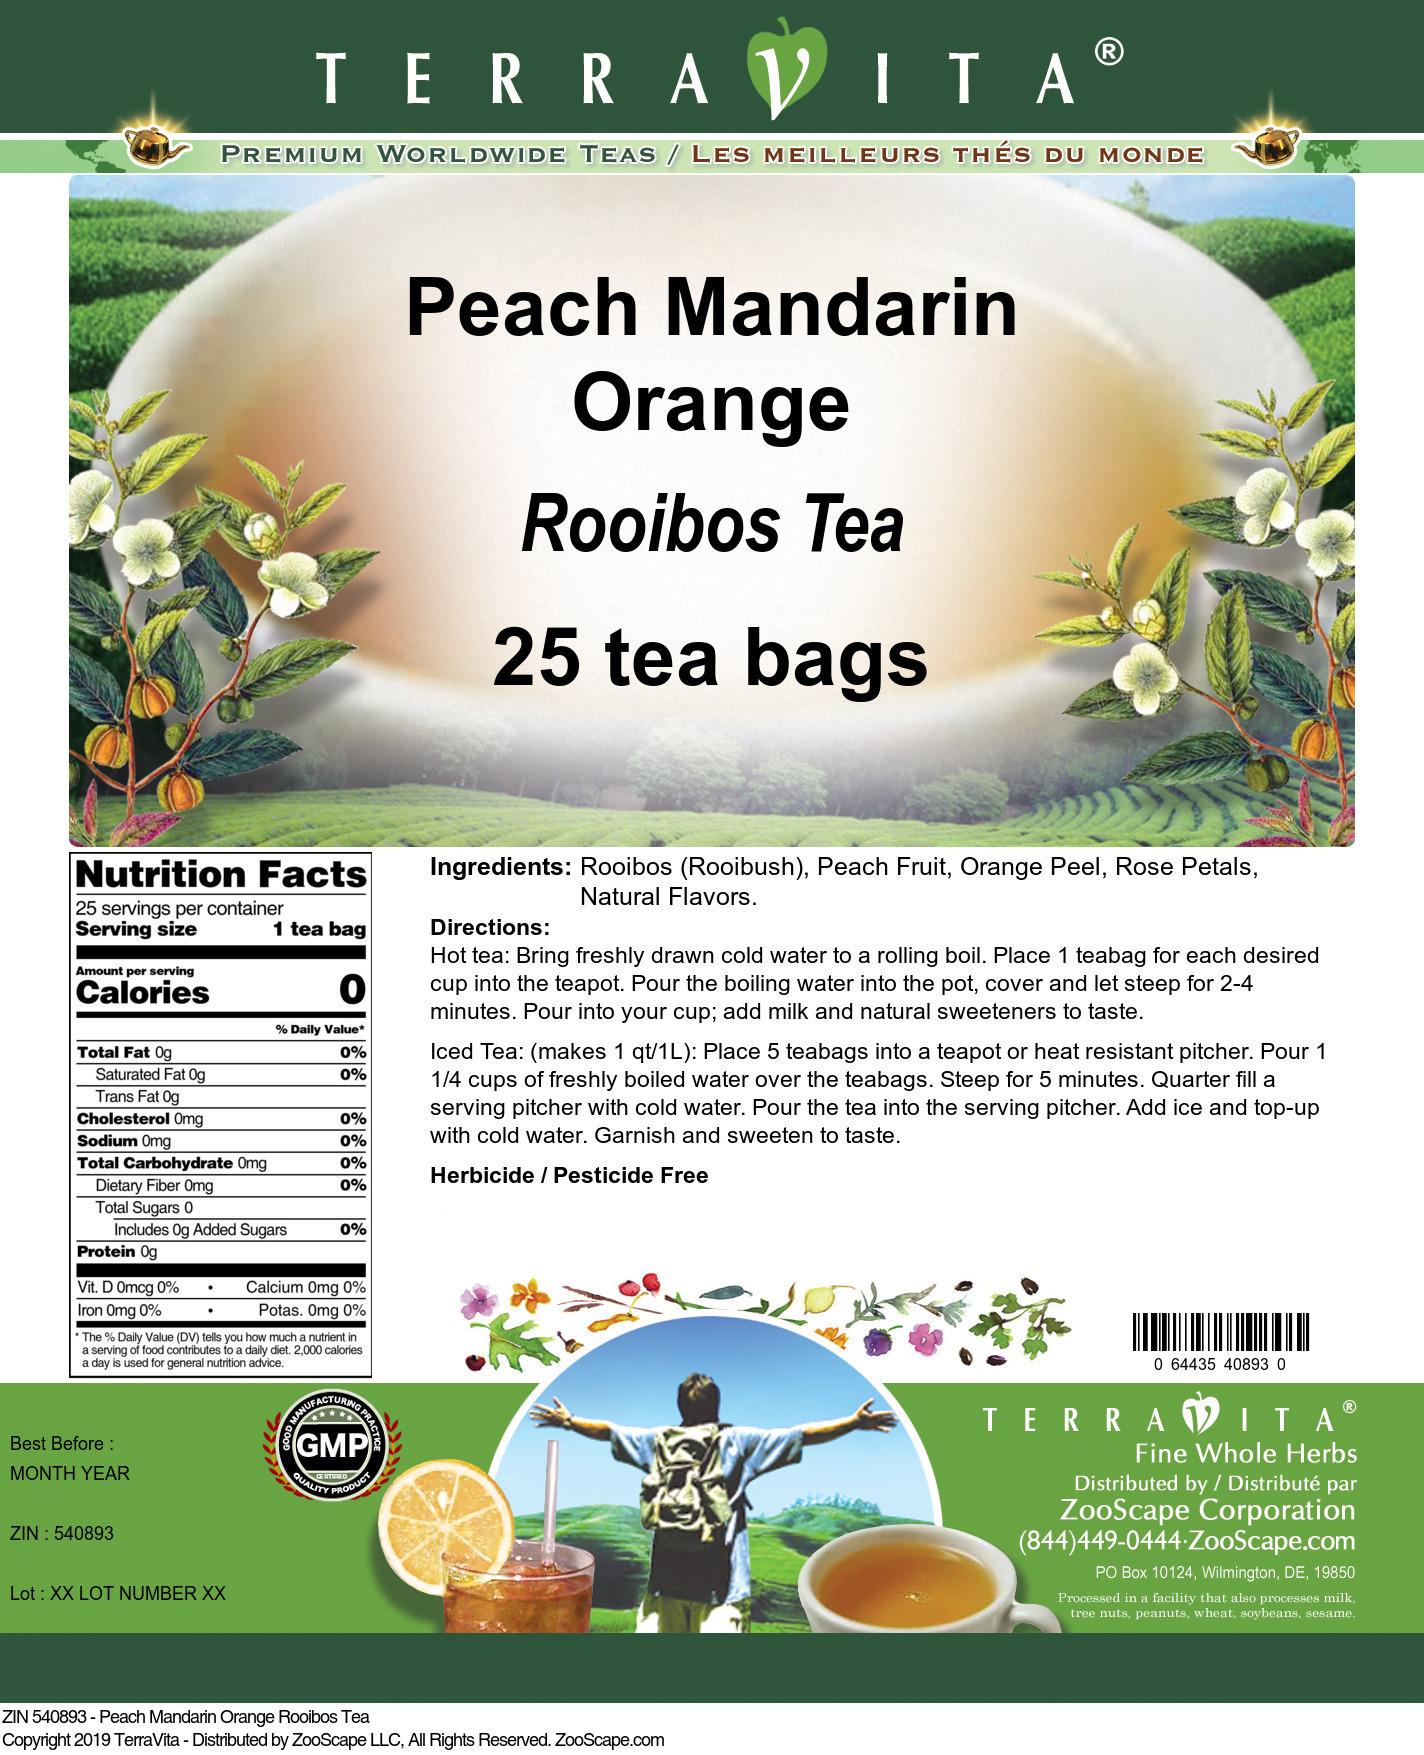 Peach Mandarin Orange Rooibos Tea